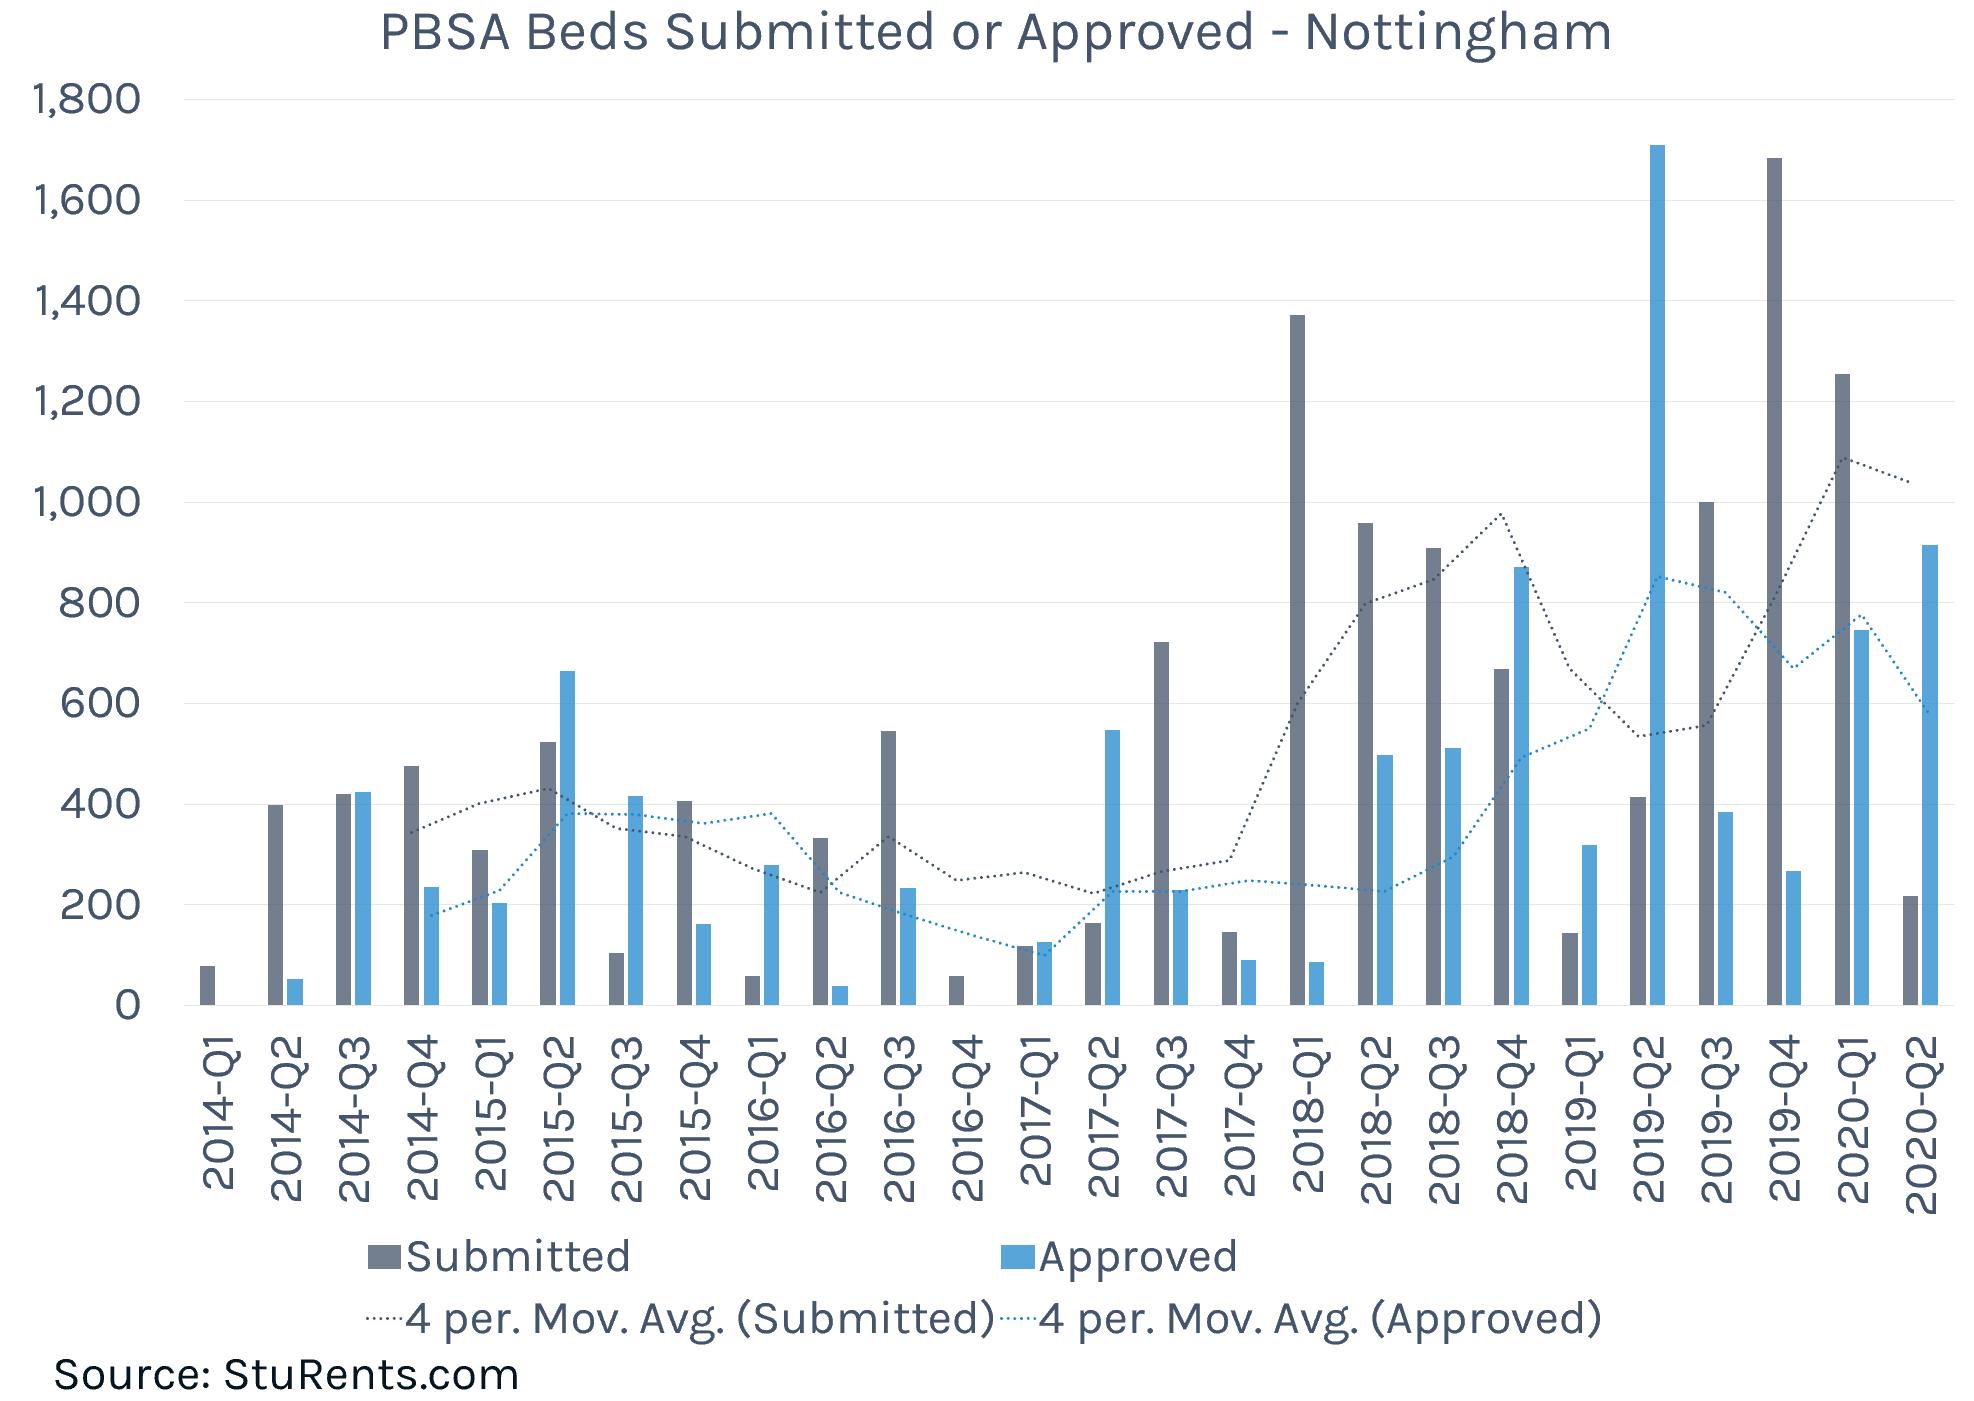 PBSA Planning Nottinghammax-width:100 height=